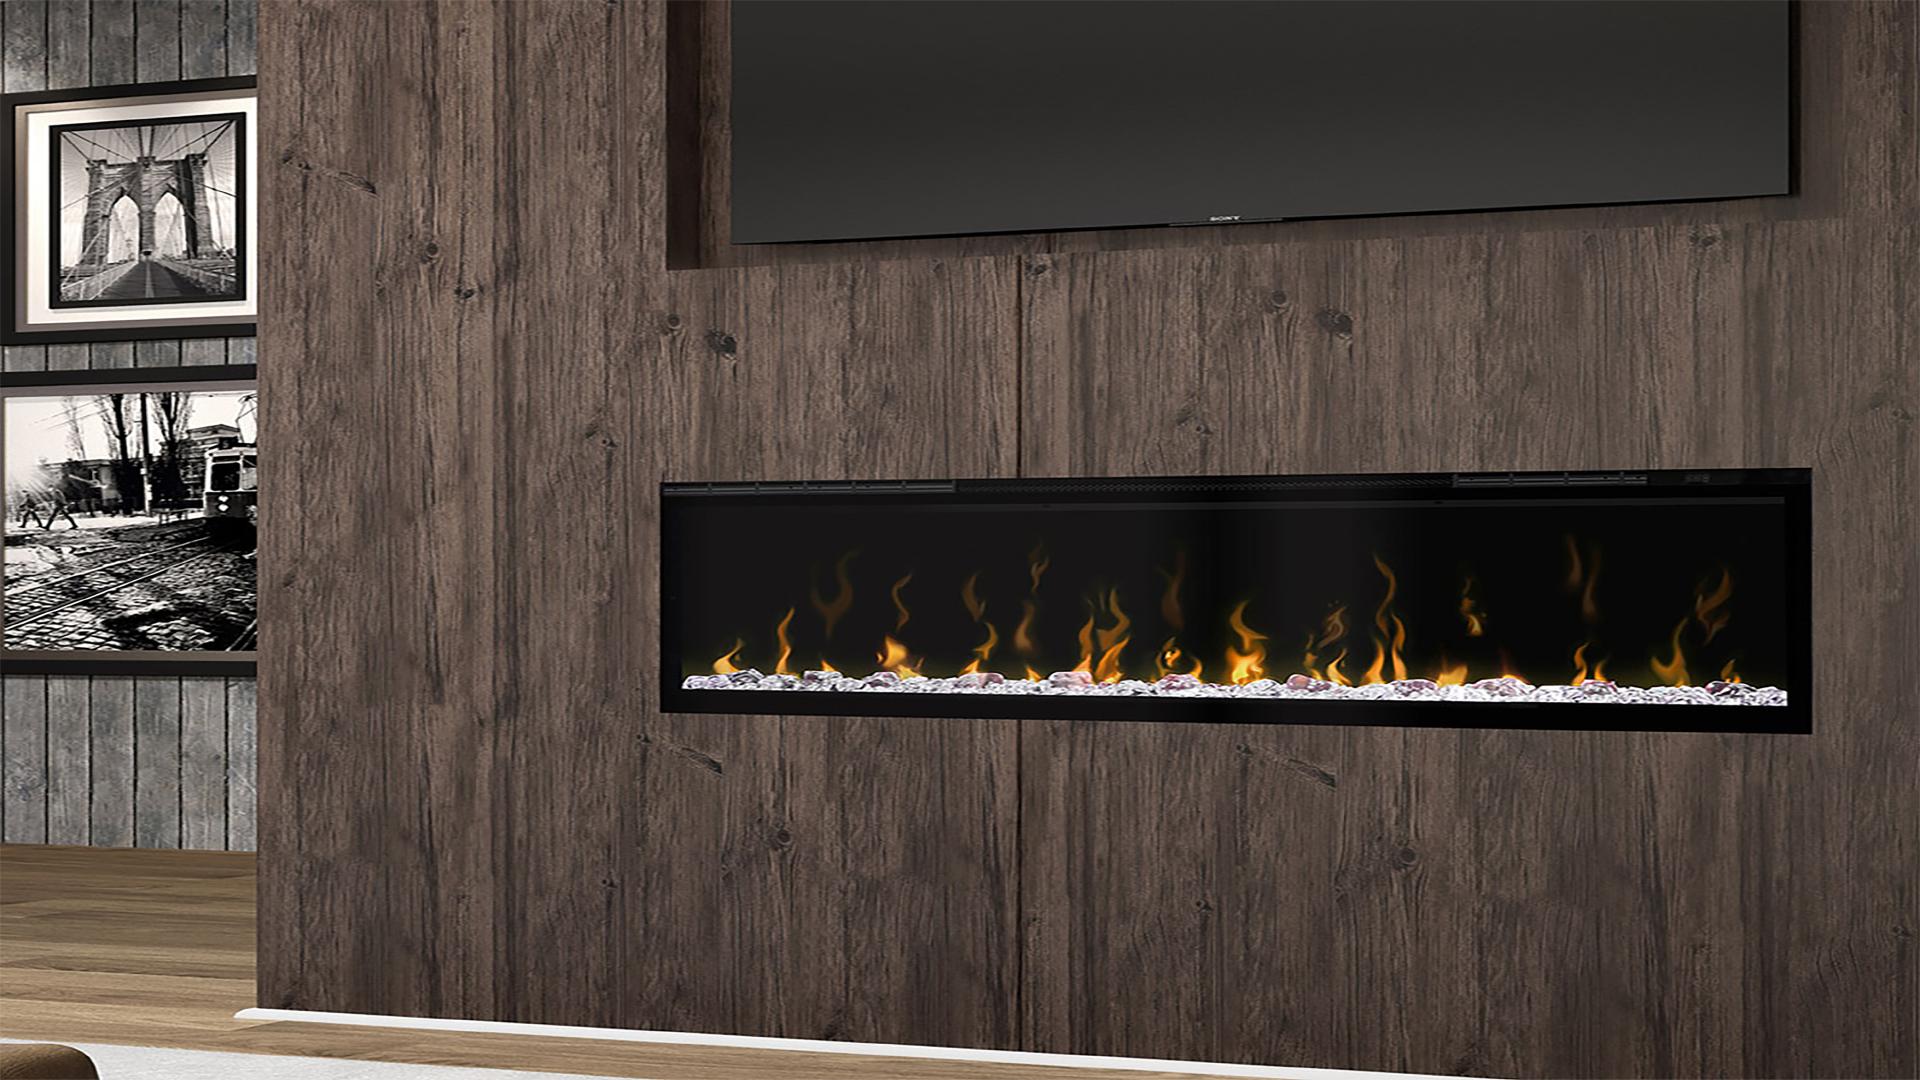 Dimplex-IgniteXL-50-Inch-Linear-Electric-Fireplace-Lifestyle